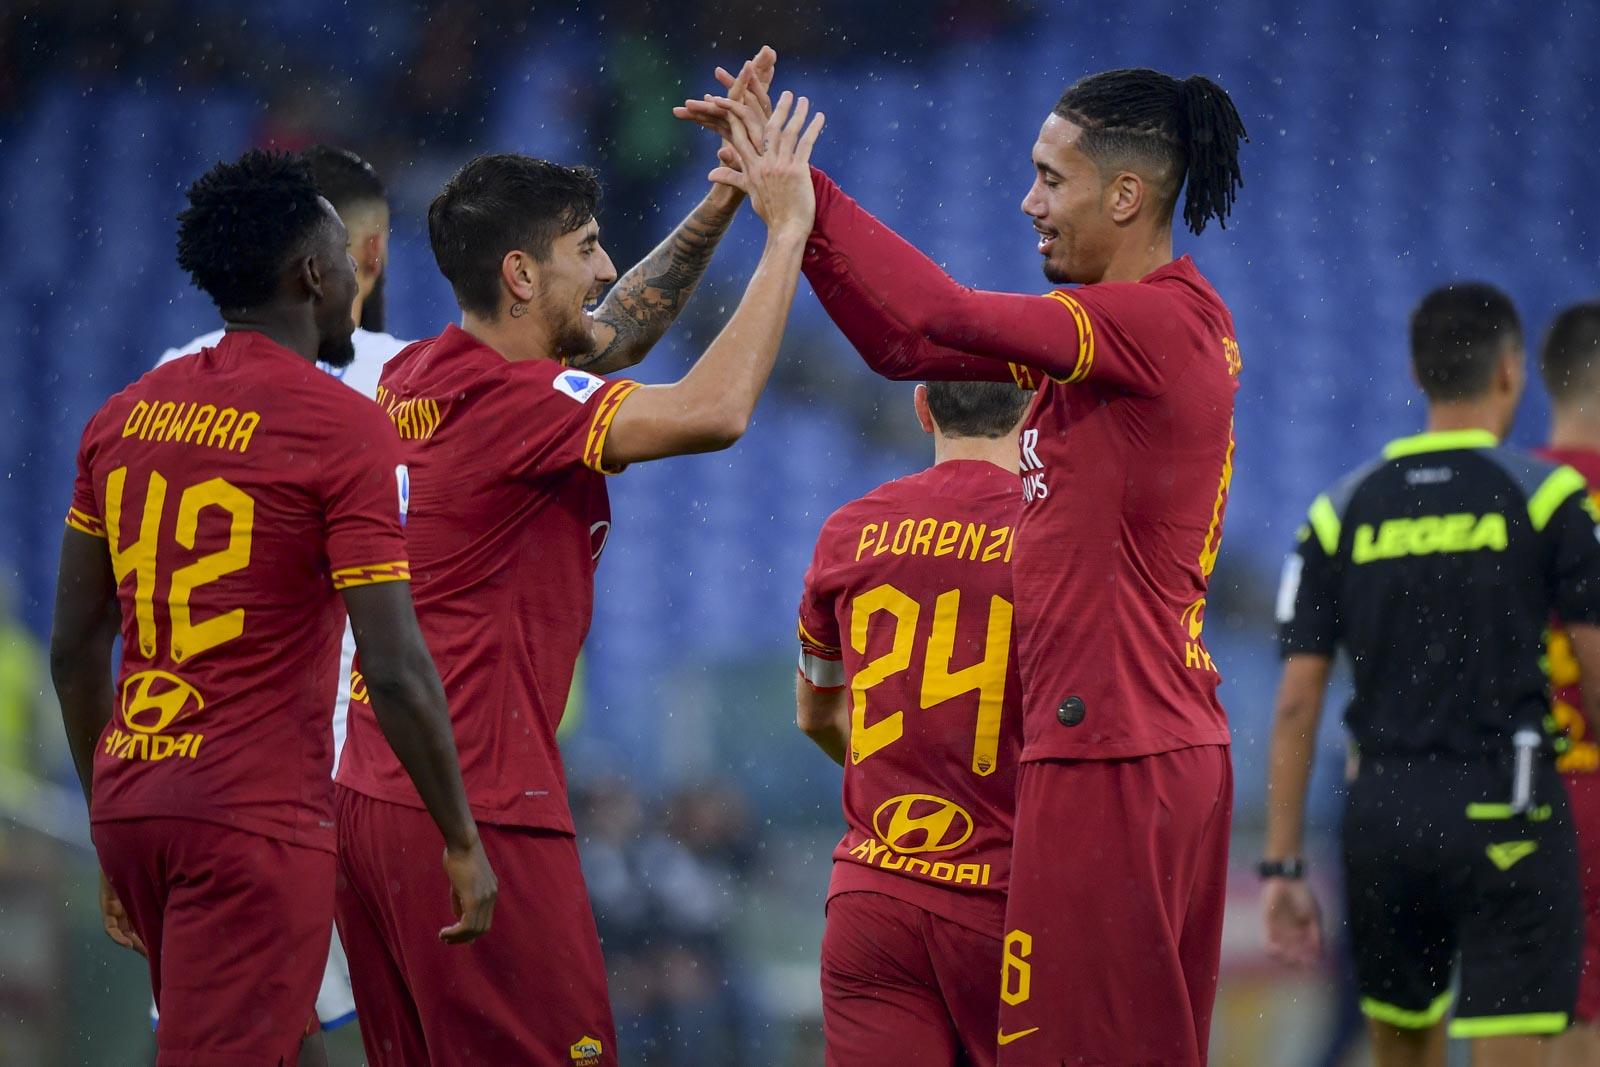 https: img-o.okeinfo.net content 2019 11 24 47 2133903 as-roma-bungkam-brescia-tiga-gol-tanpa-balas-XlBVL7nAFb.jpg